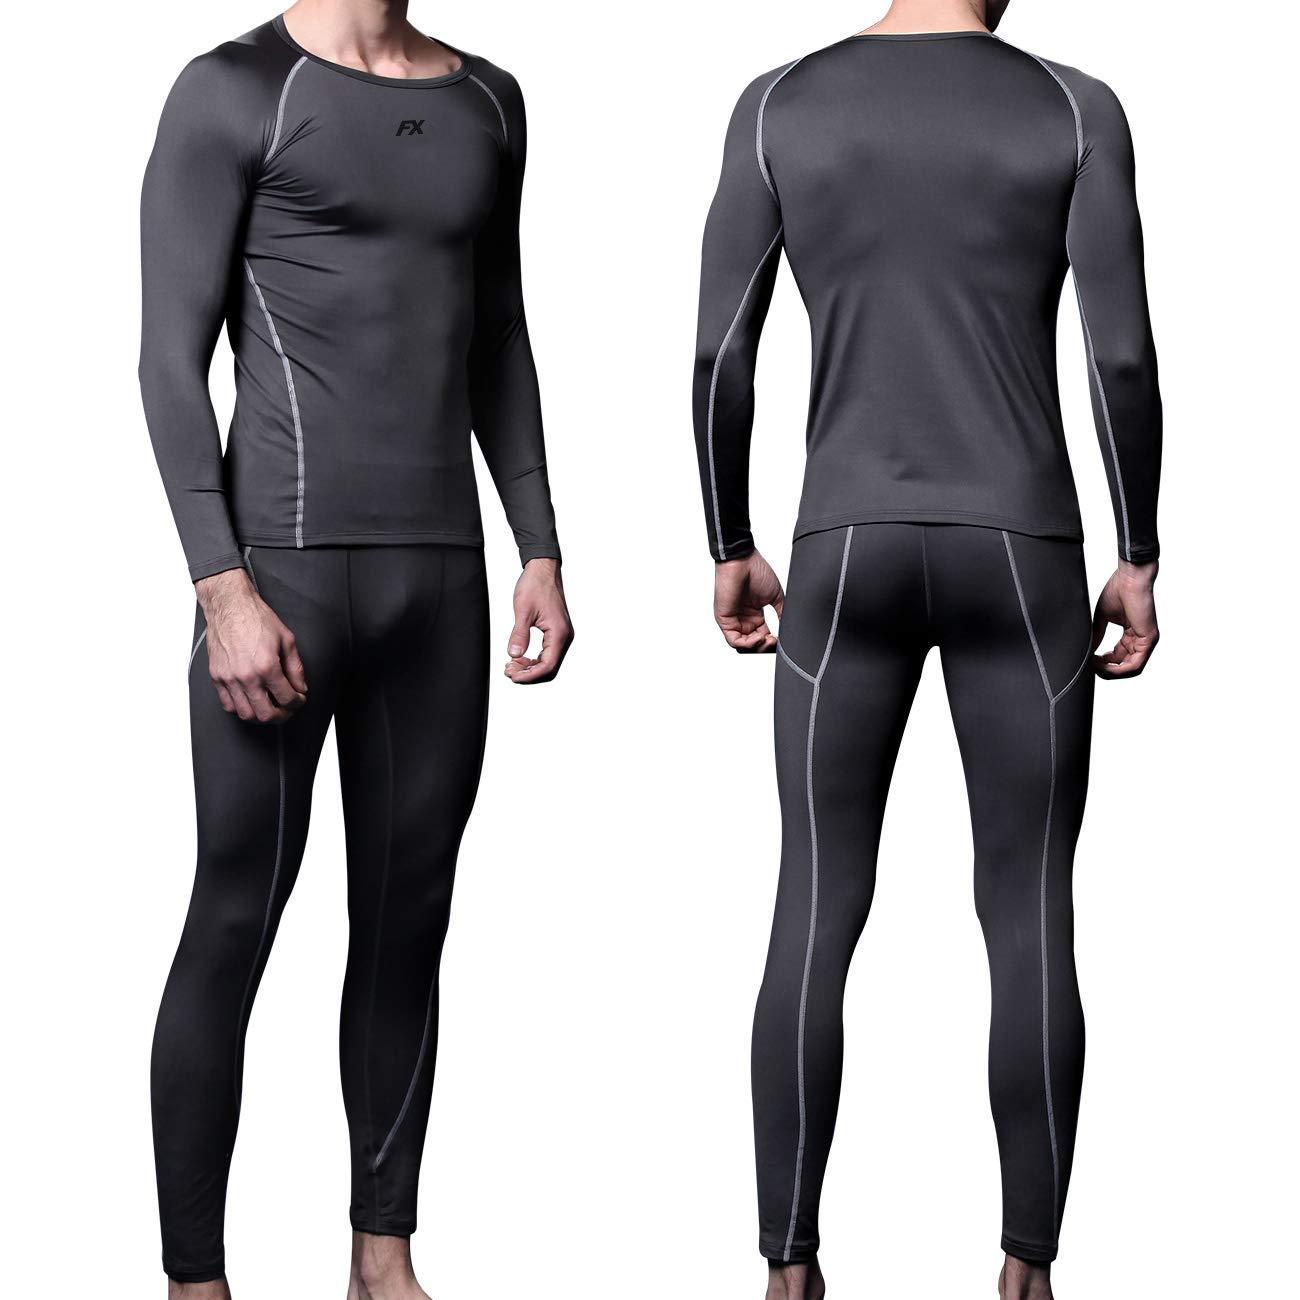 FITEXTREME MAXHEAT Fleece Thermal Underwear